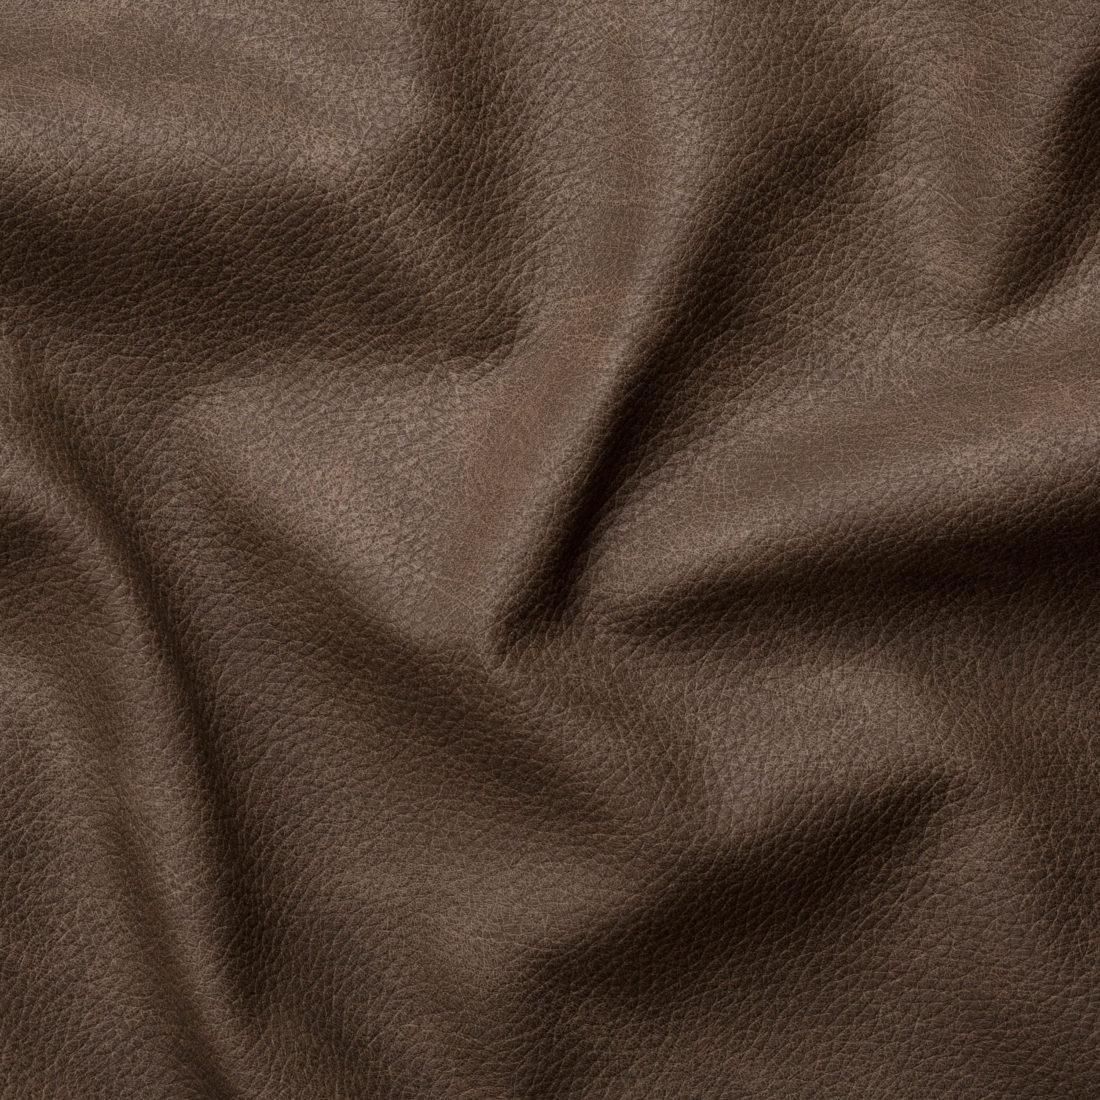 Меблева тканина Wave 106 Brown, штучна шкіра